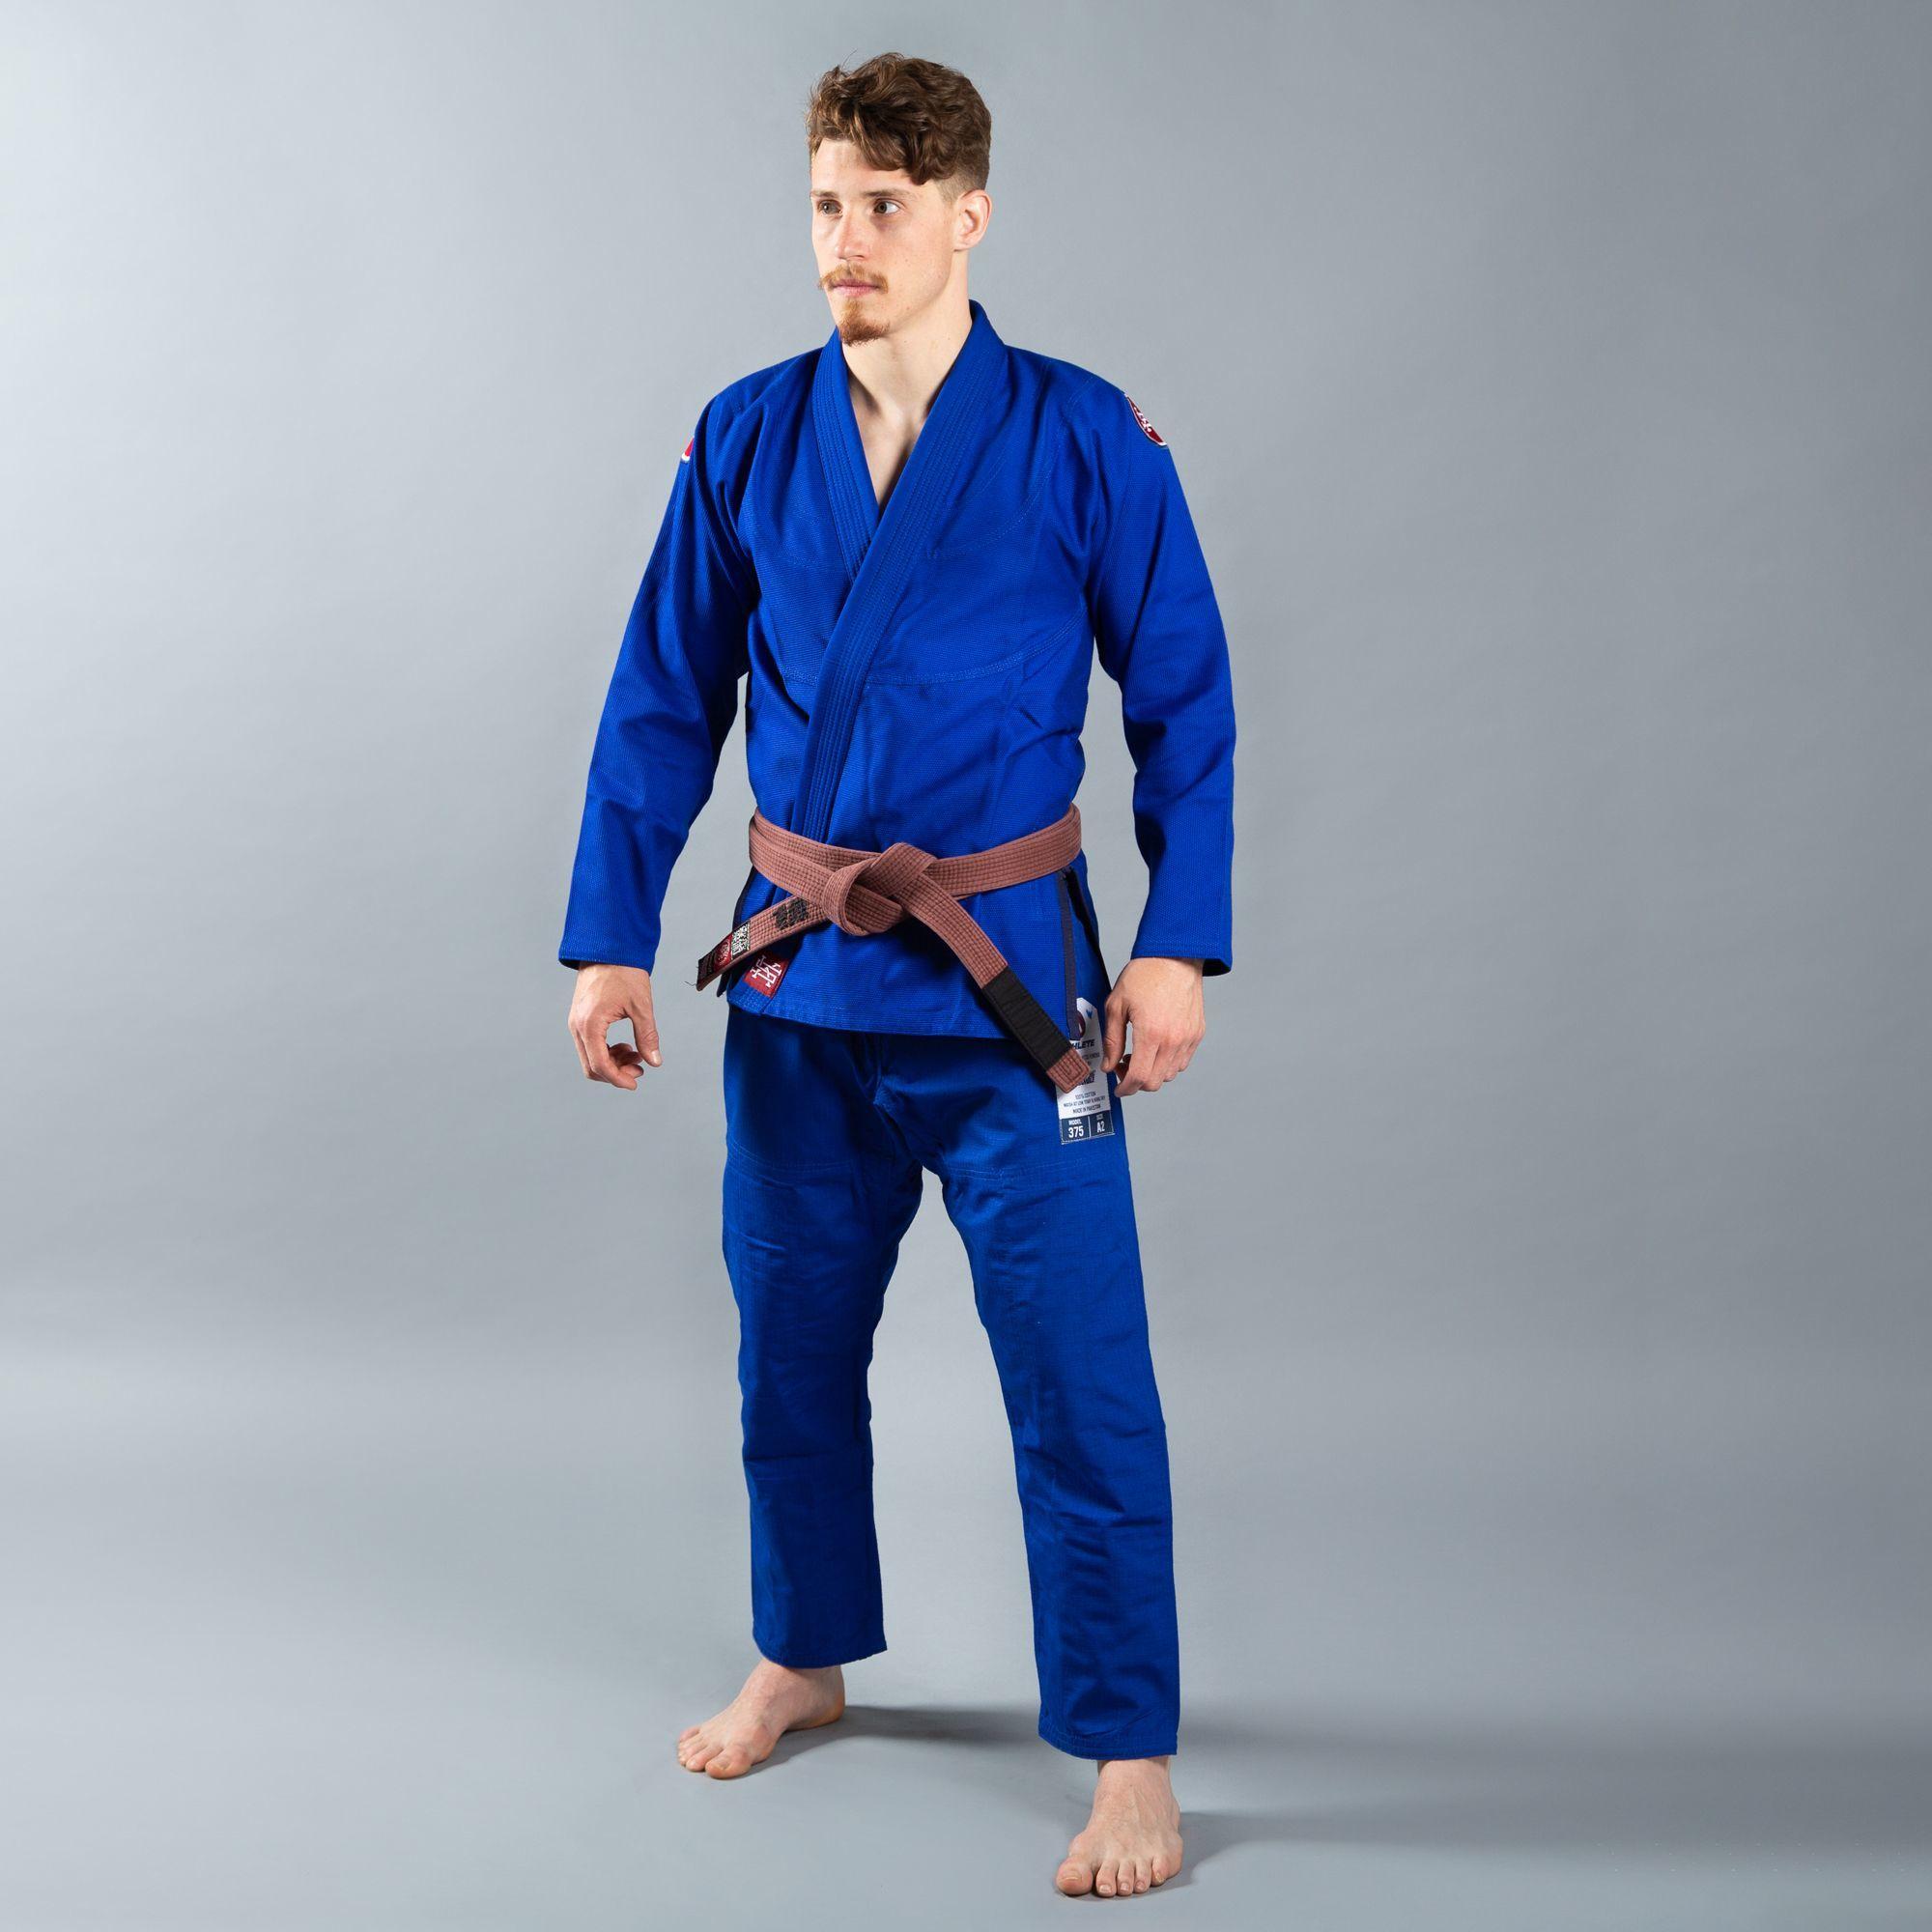 SCRAMBLE ATHLETE 4:375(ブルー、青)|ブラジリアン柔術衣